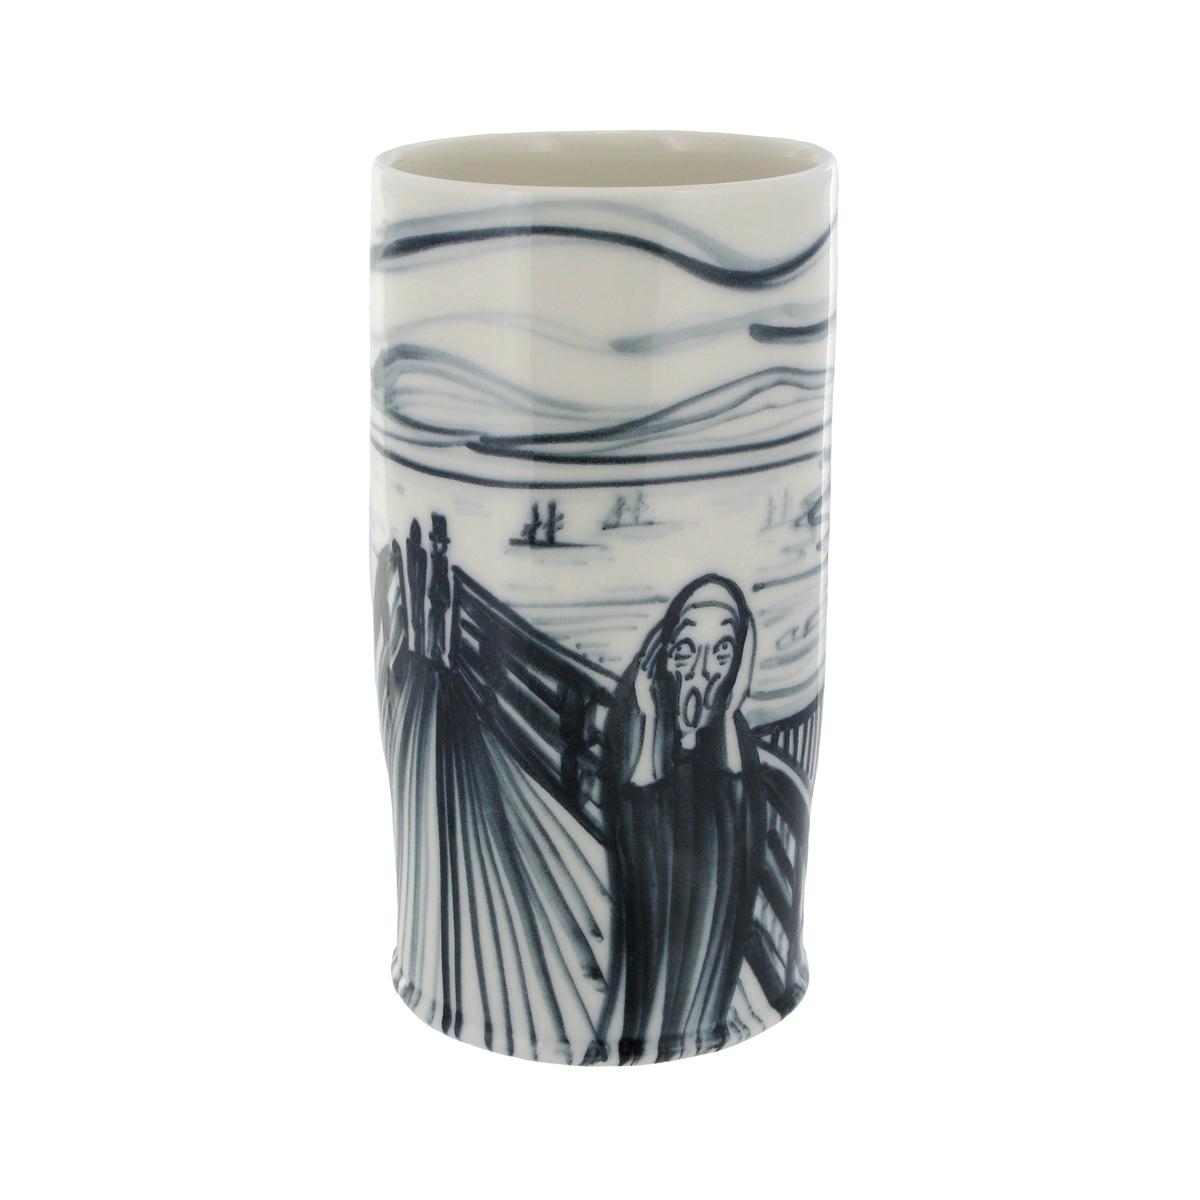 The Scream porcelain vase